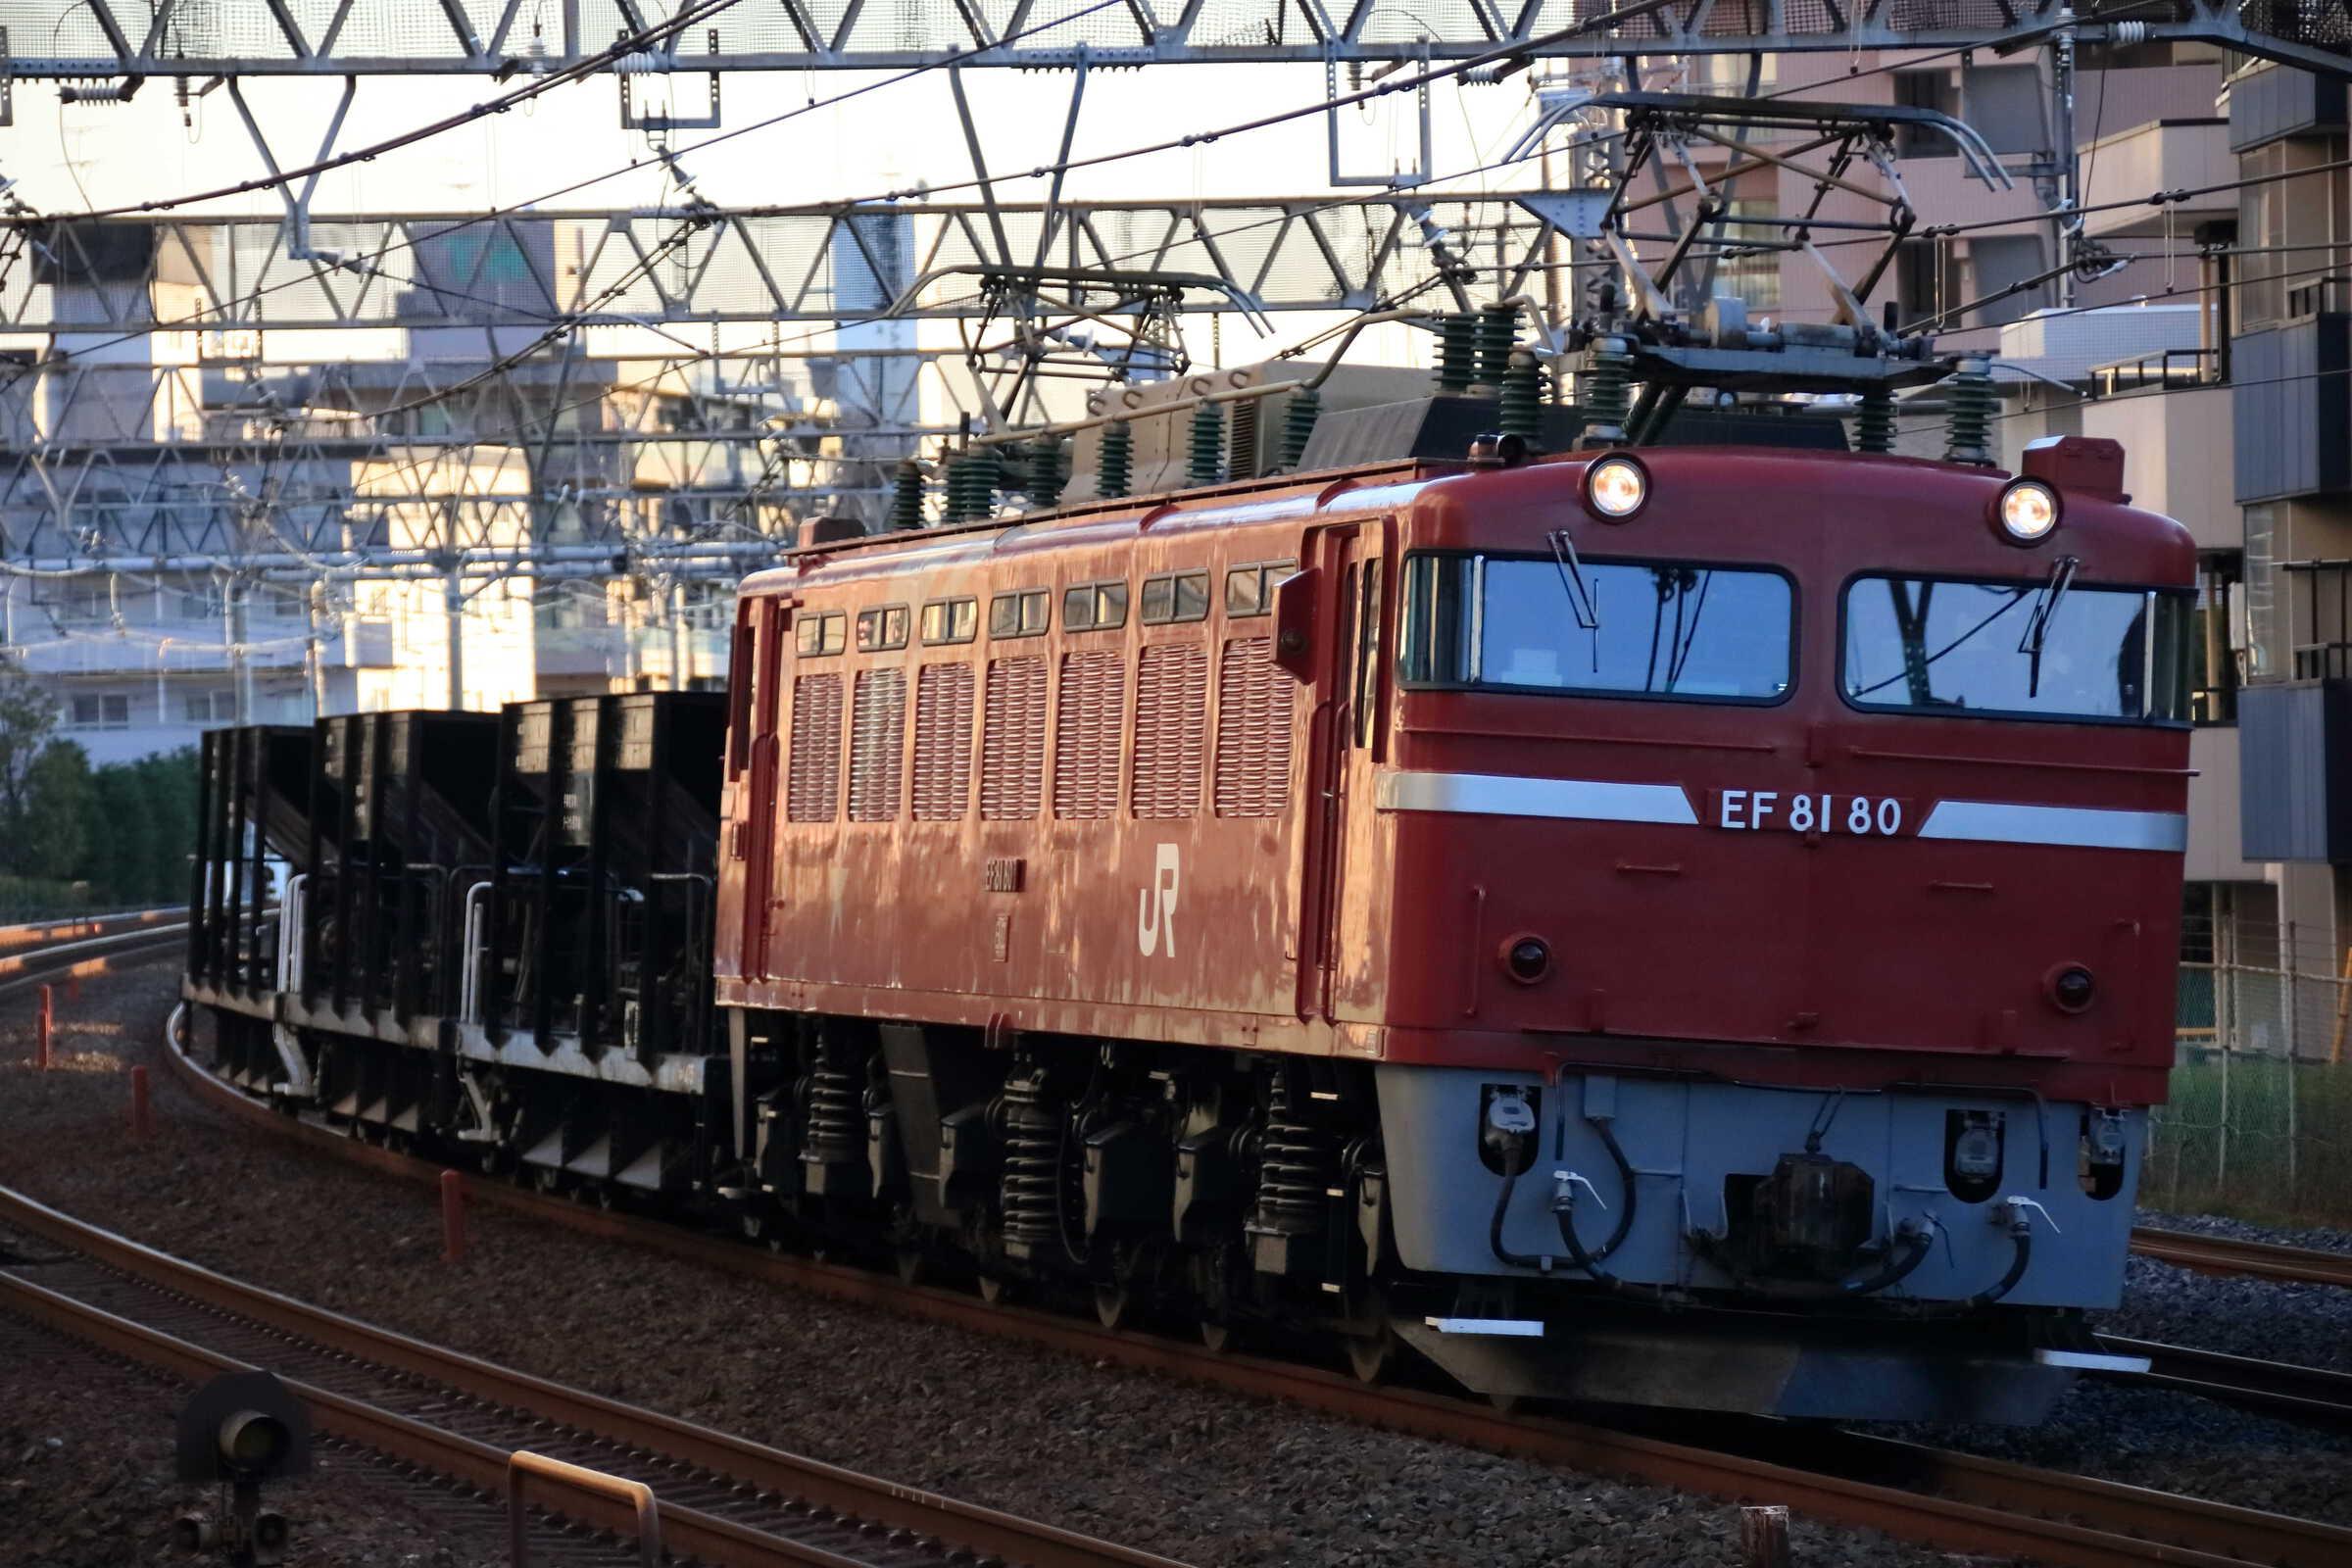 配8937列車 交検出場配給 EF81-80①[田]+ホキ3両